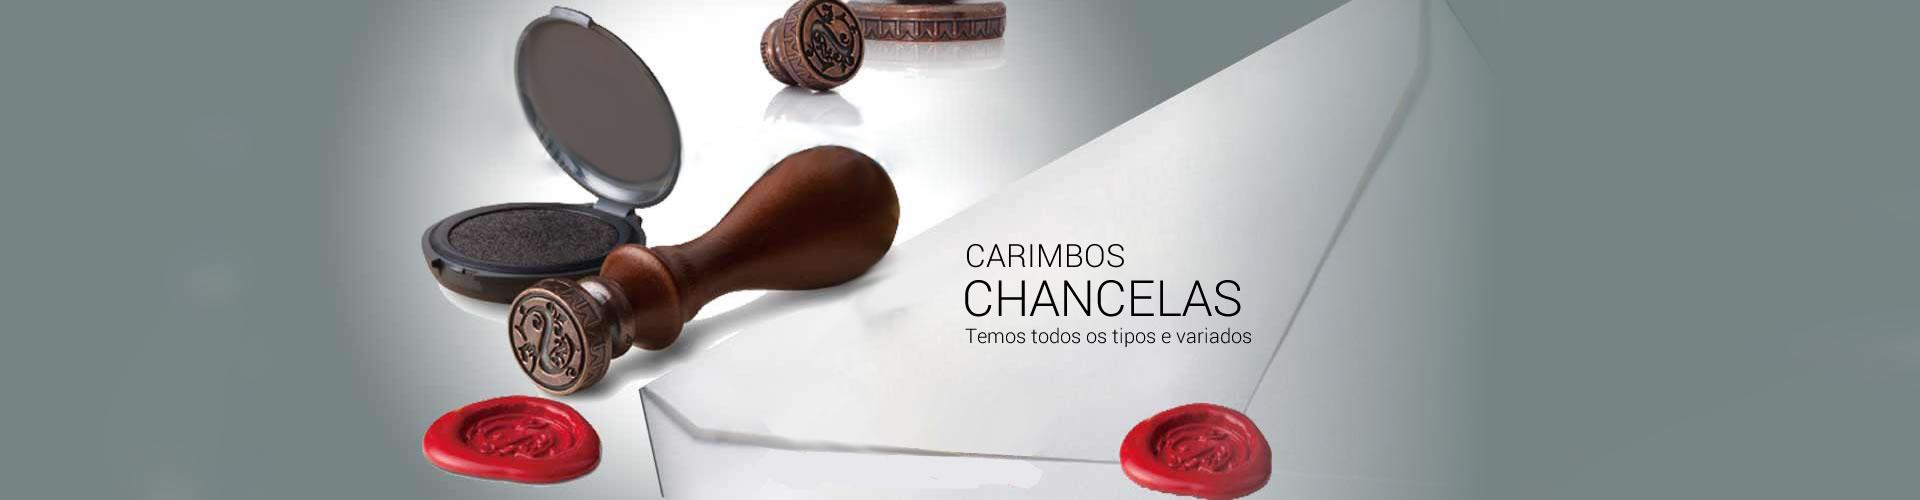 carimbos-chacelas